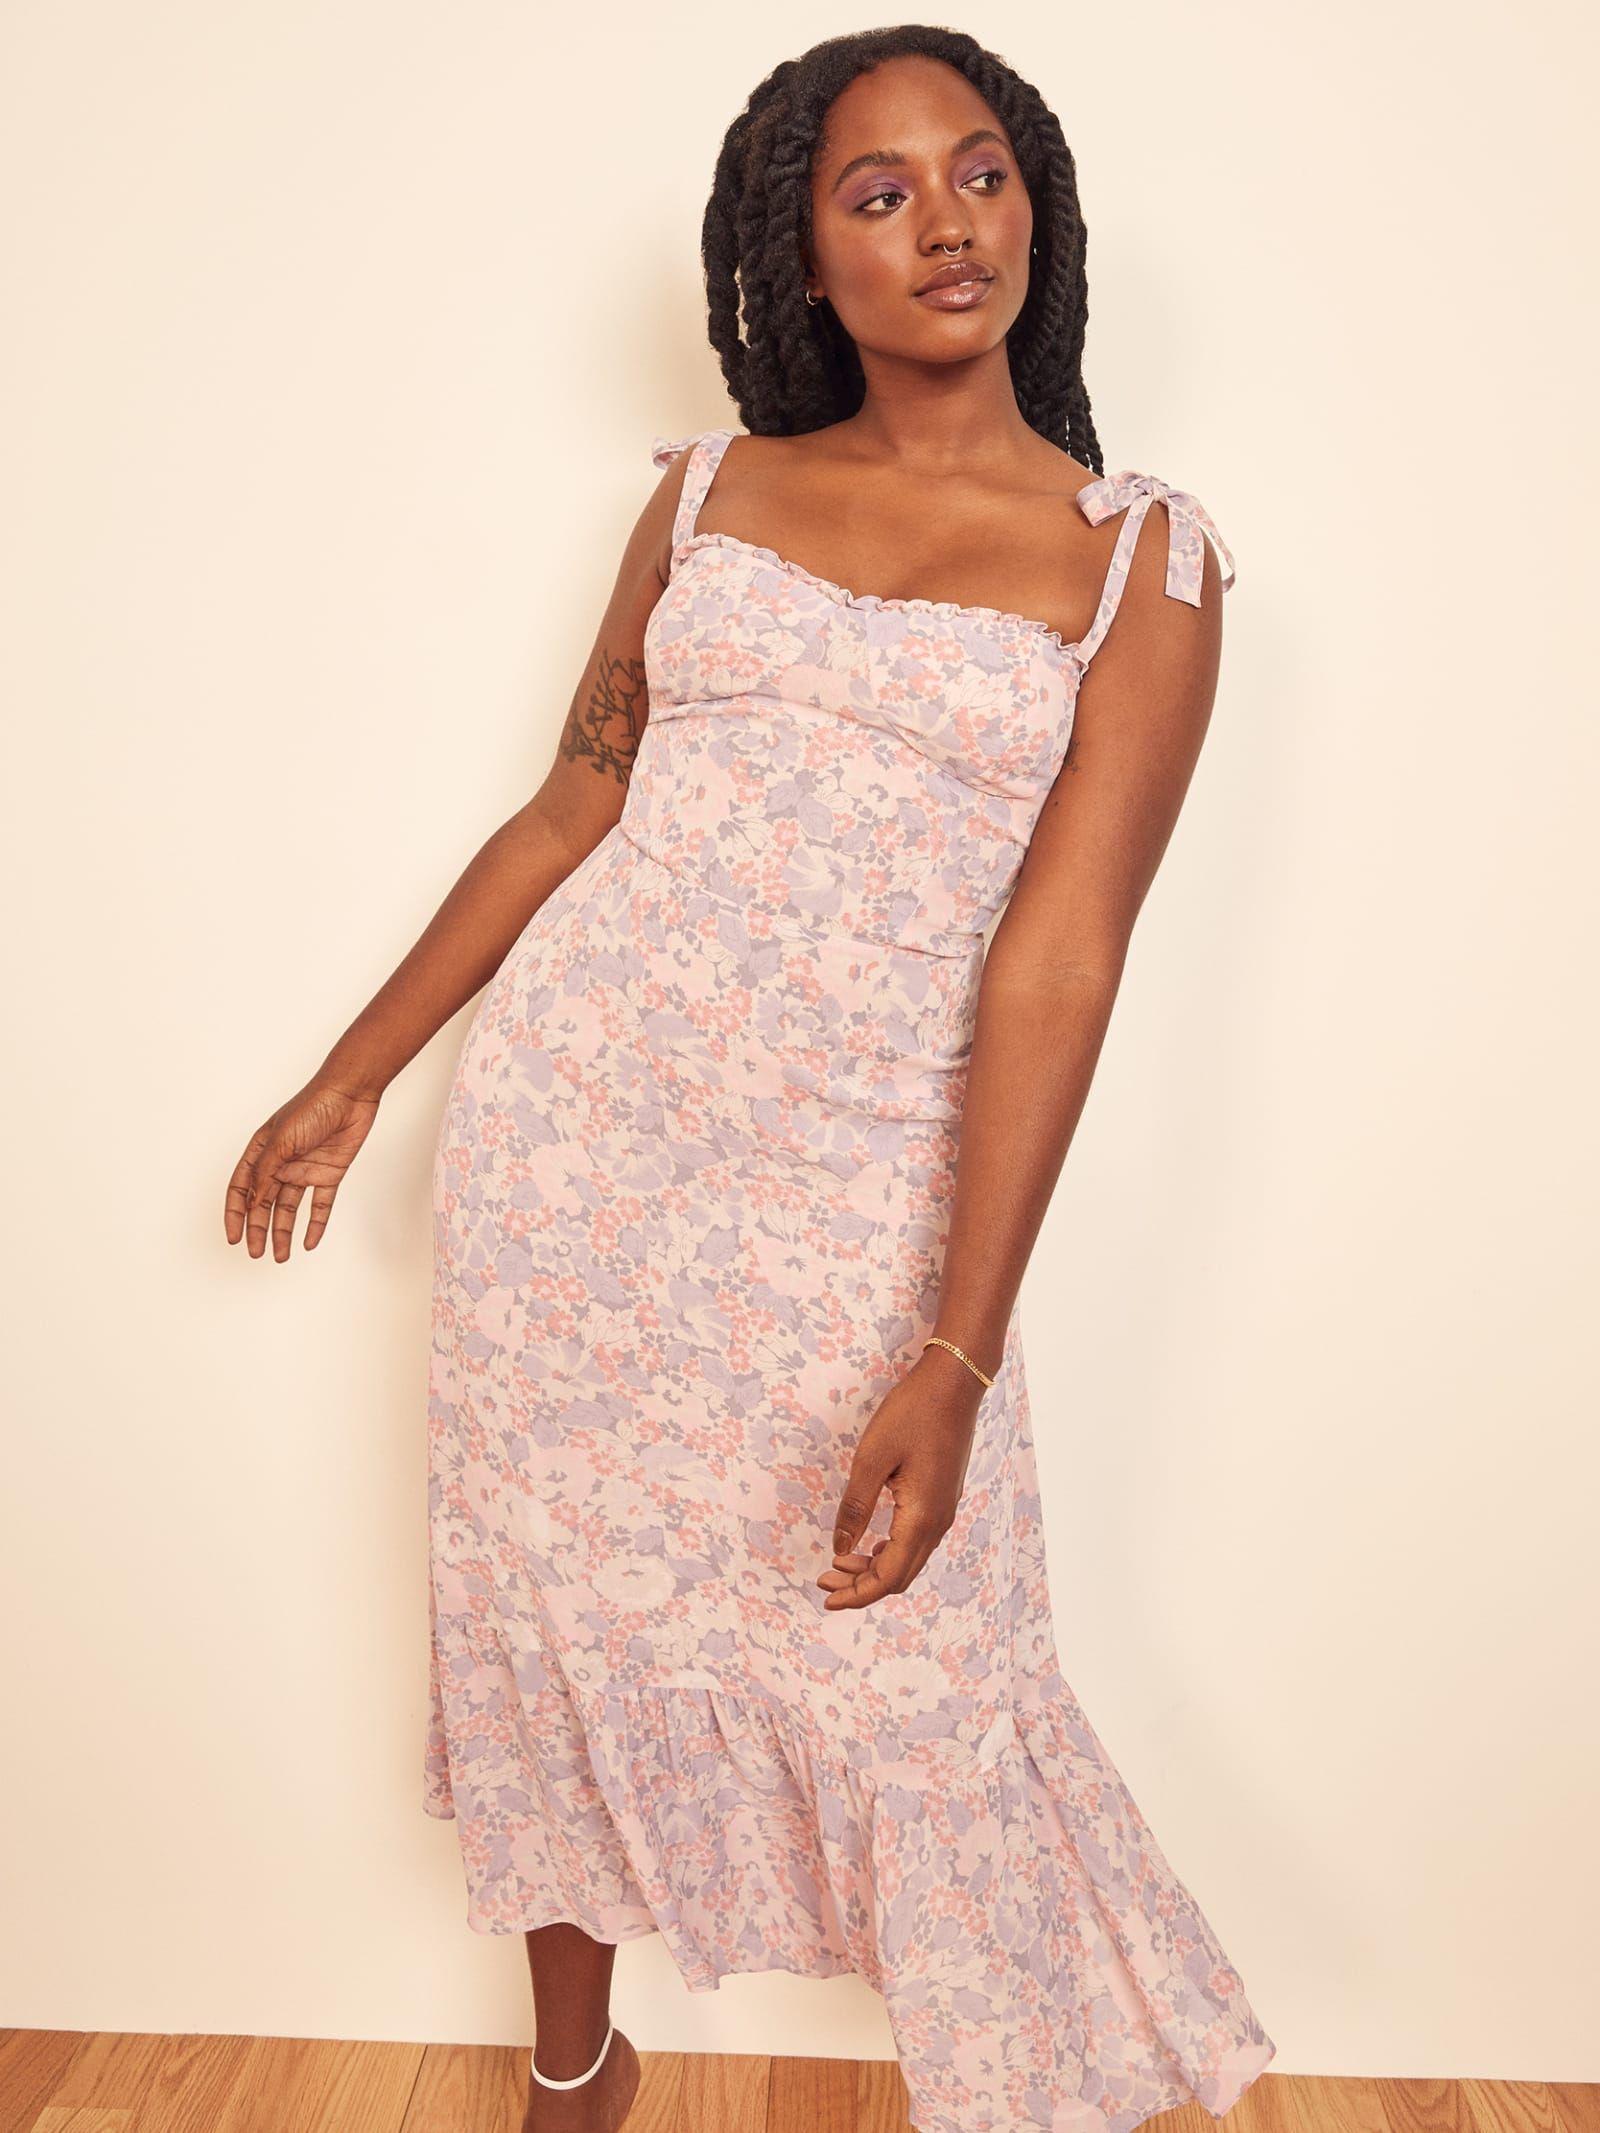 Dear Lover Ruffles Summer Party Dresses Nude Jacinth